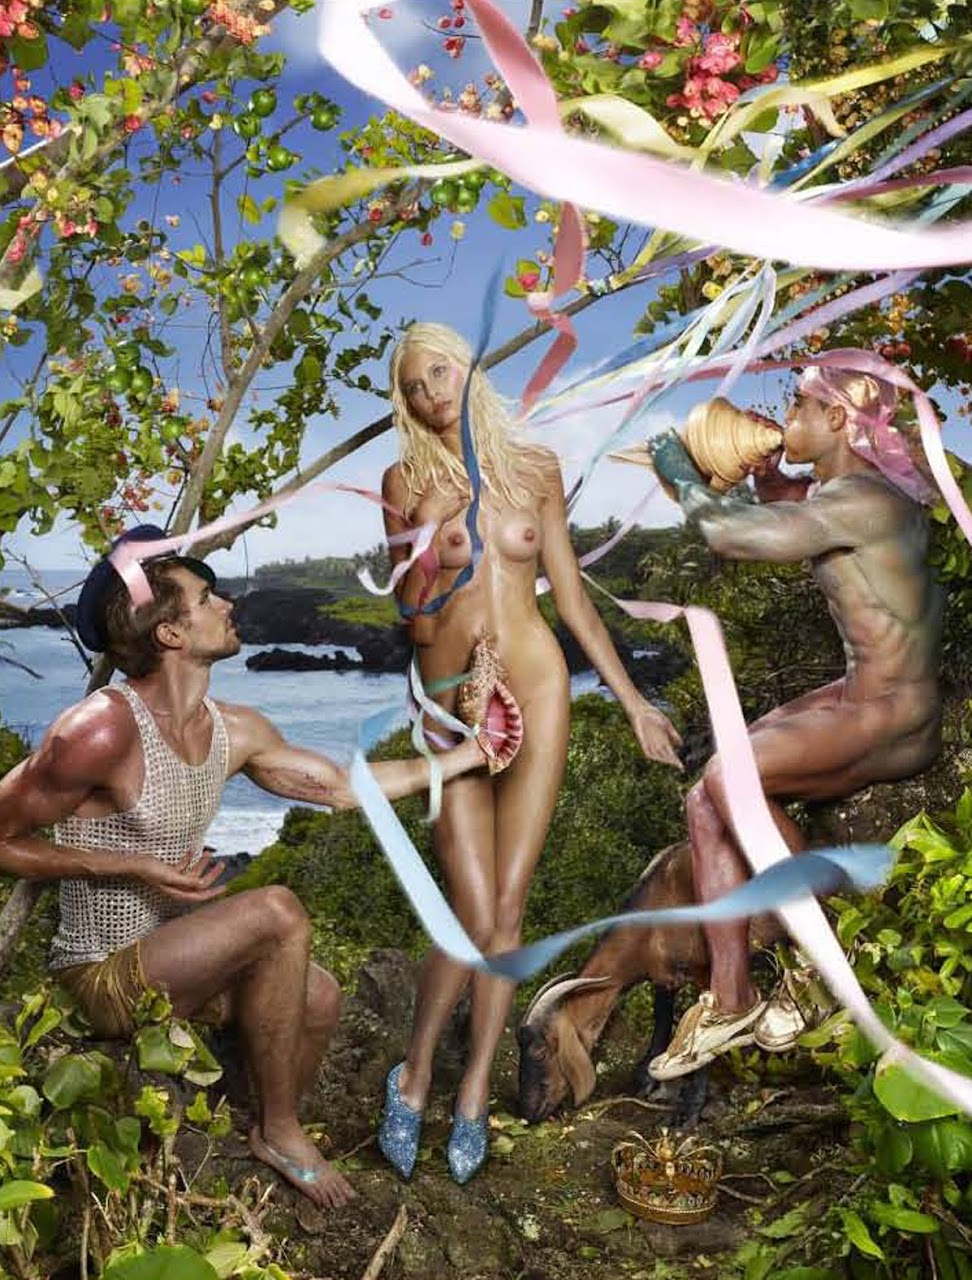 http://2.bp.blogspot.com/_KBZ2FpXSlJk/S9c44piKVfI/AAAAAAAAE-E/4zdwK1mxHtk/s1280/Lachapelle+The+Birth+of+Venus.jpg